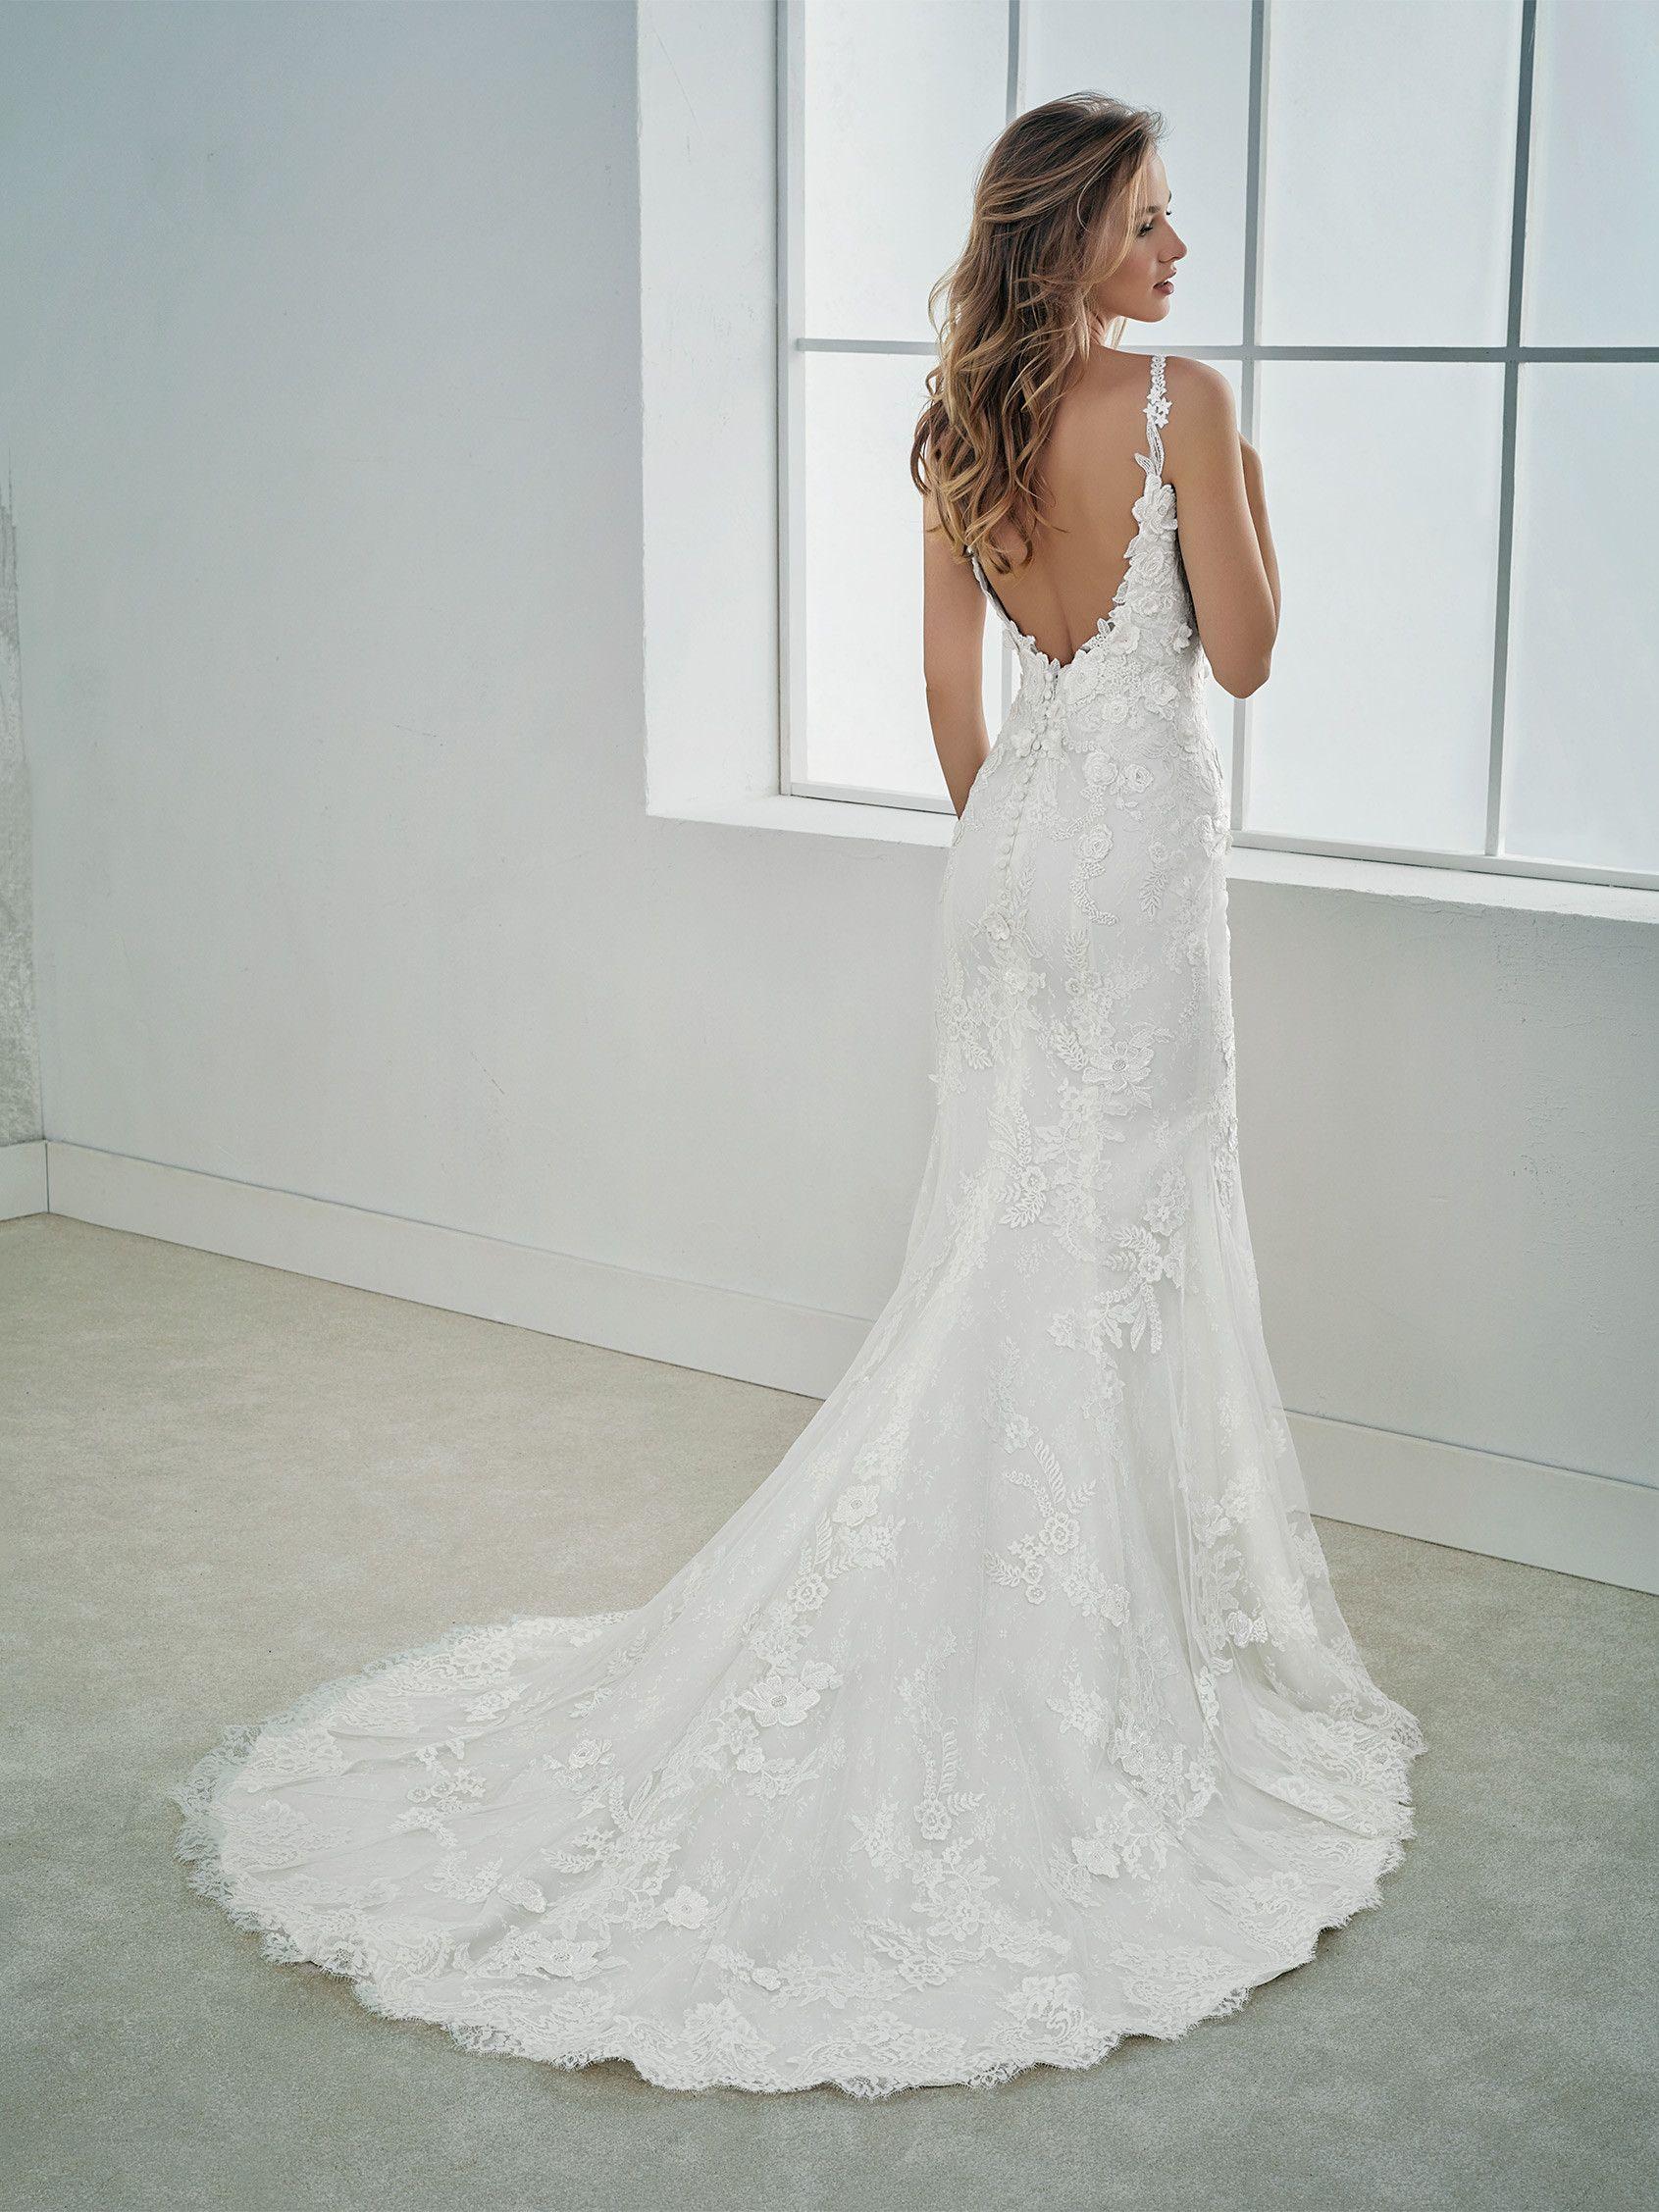 FALEIA Träger | EIB & JJPR Wedding - Wedding Dresses | Pinterest ...